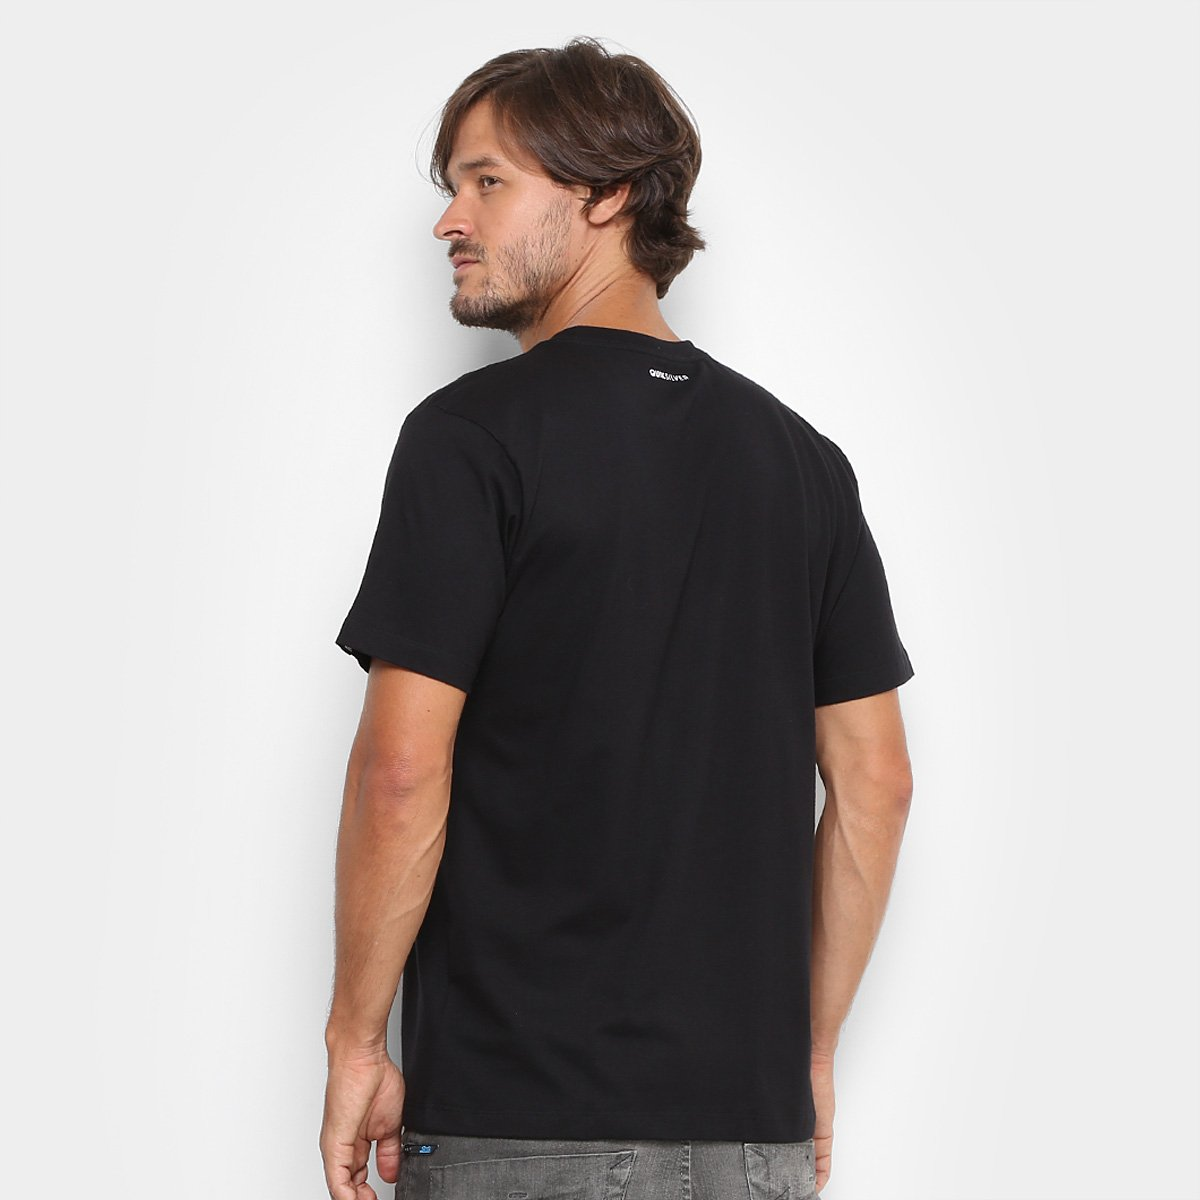 Camiseta Quiksilver Básica Light Rays Masculina - Compre Agora ... 0602241bce0